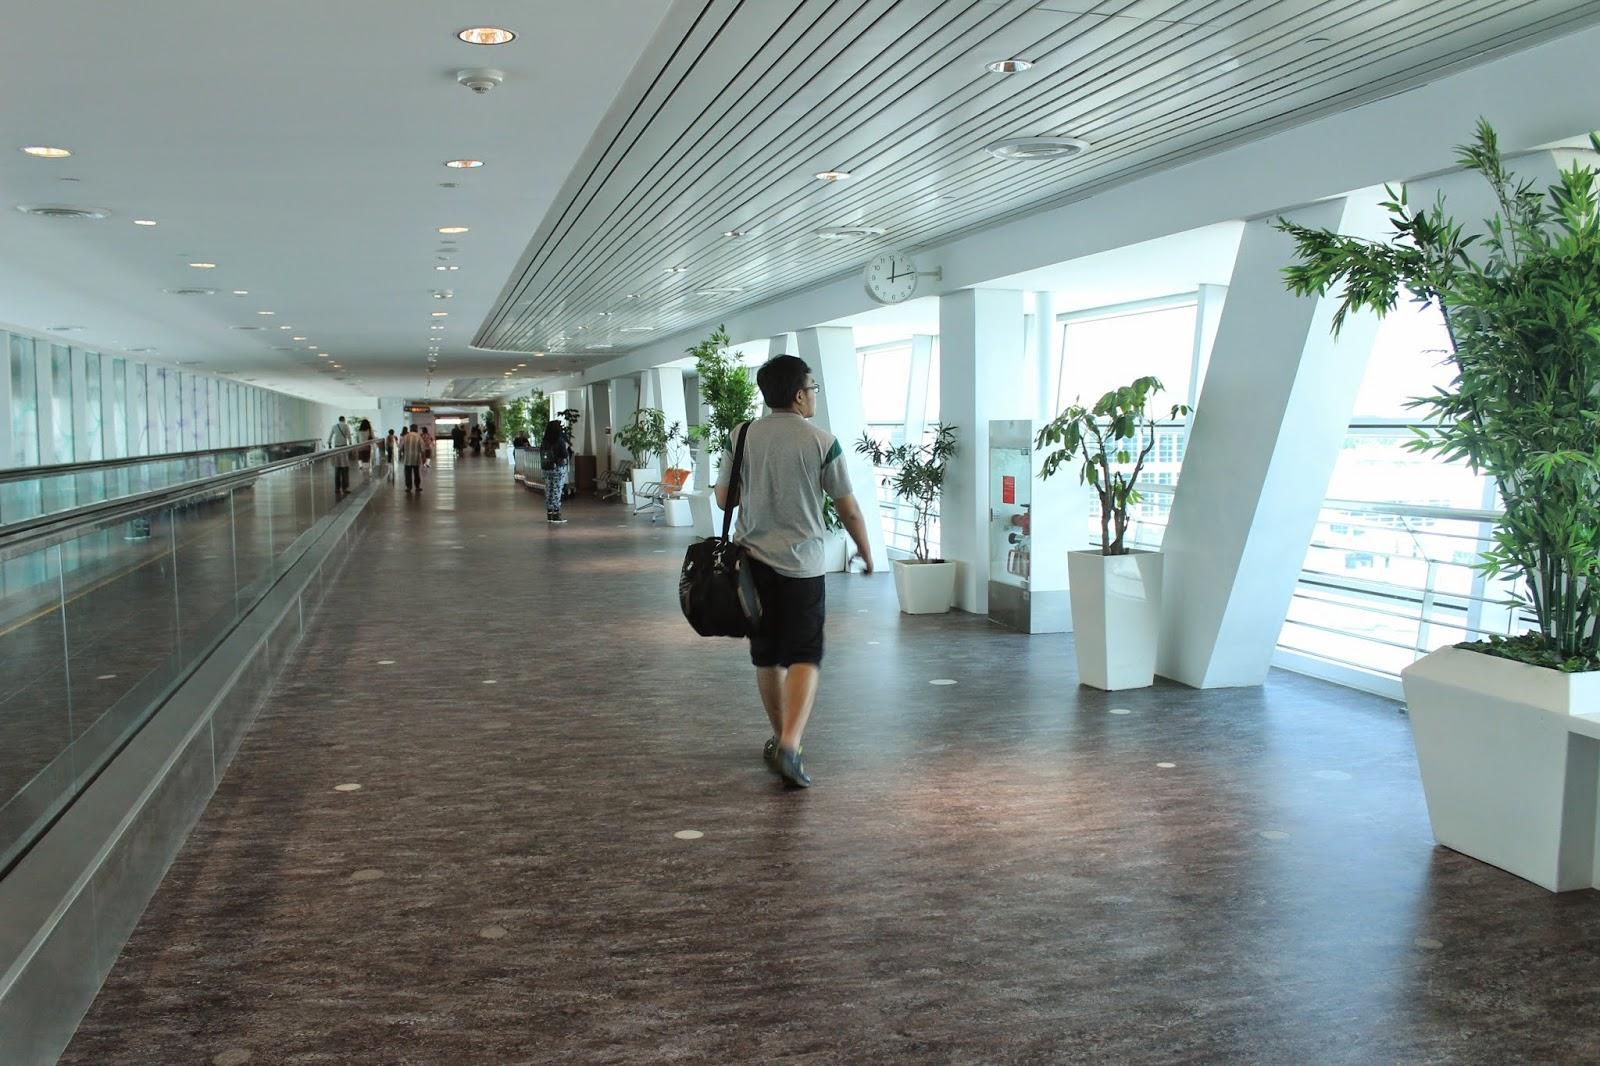 Bandar Udara Internasional Soekarno-Hatta - Wikipedia